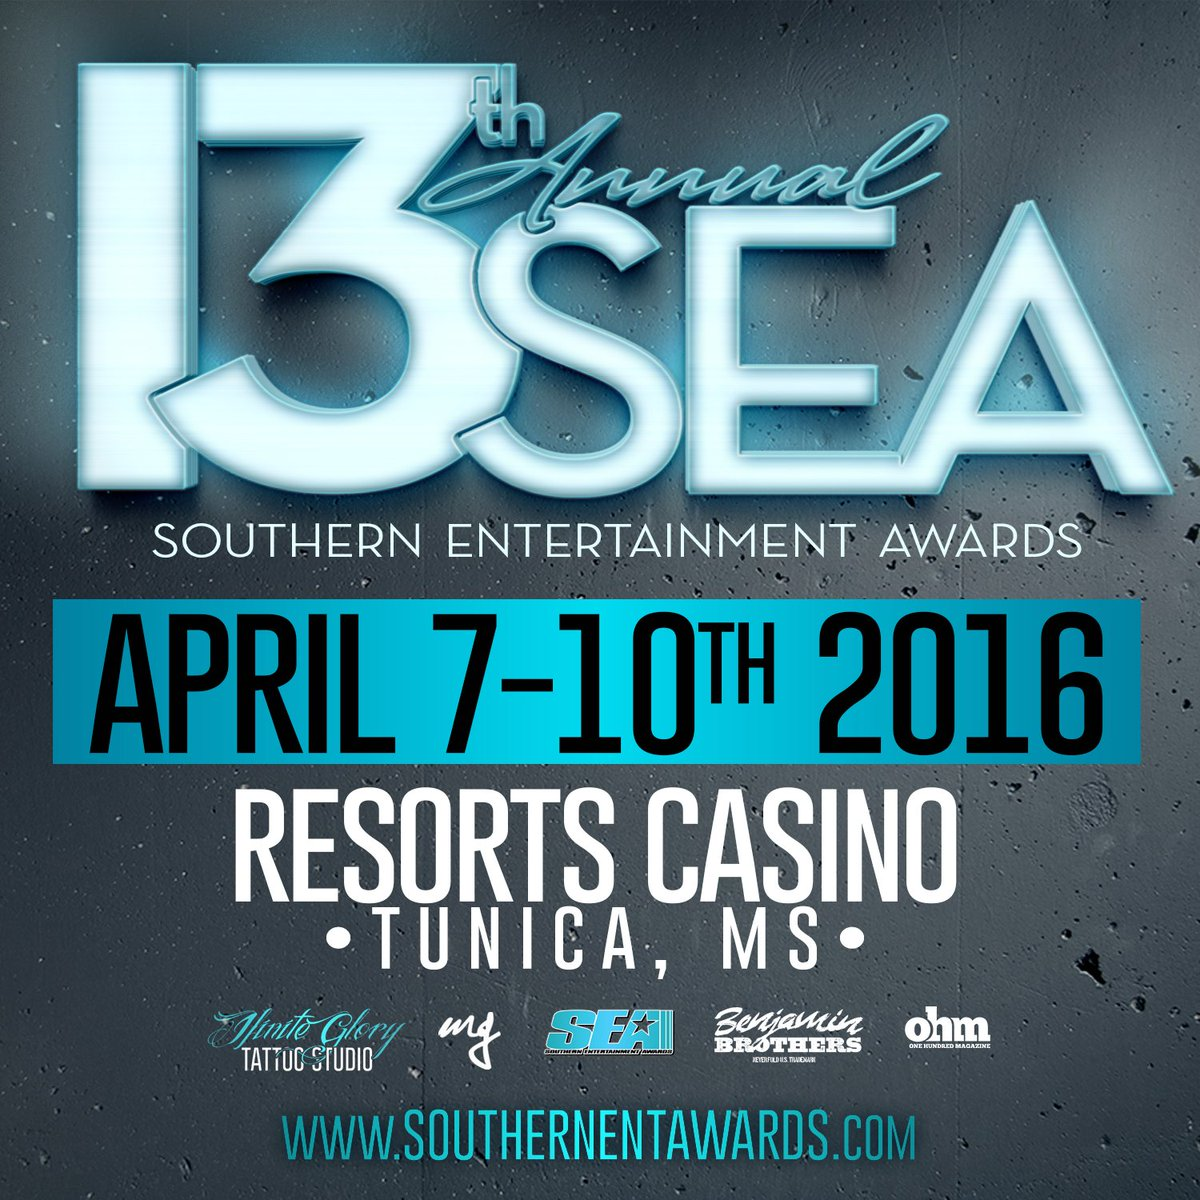 #SEA2016 Apr 7-10th #ResortsCasino #TunicaMS https://t.co/SVLFORhepn